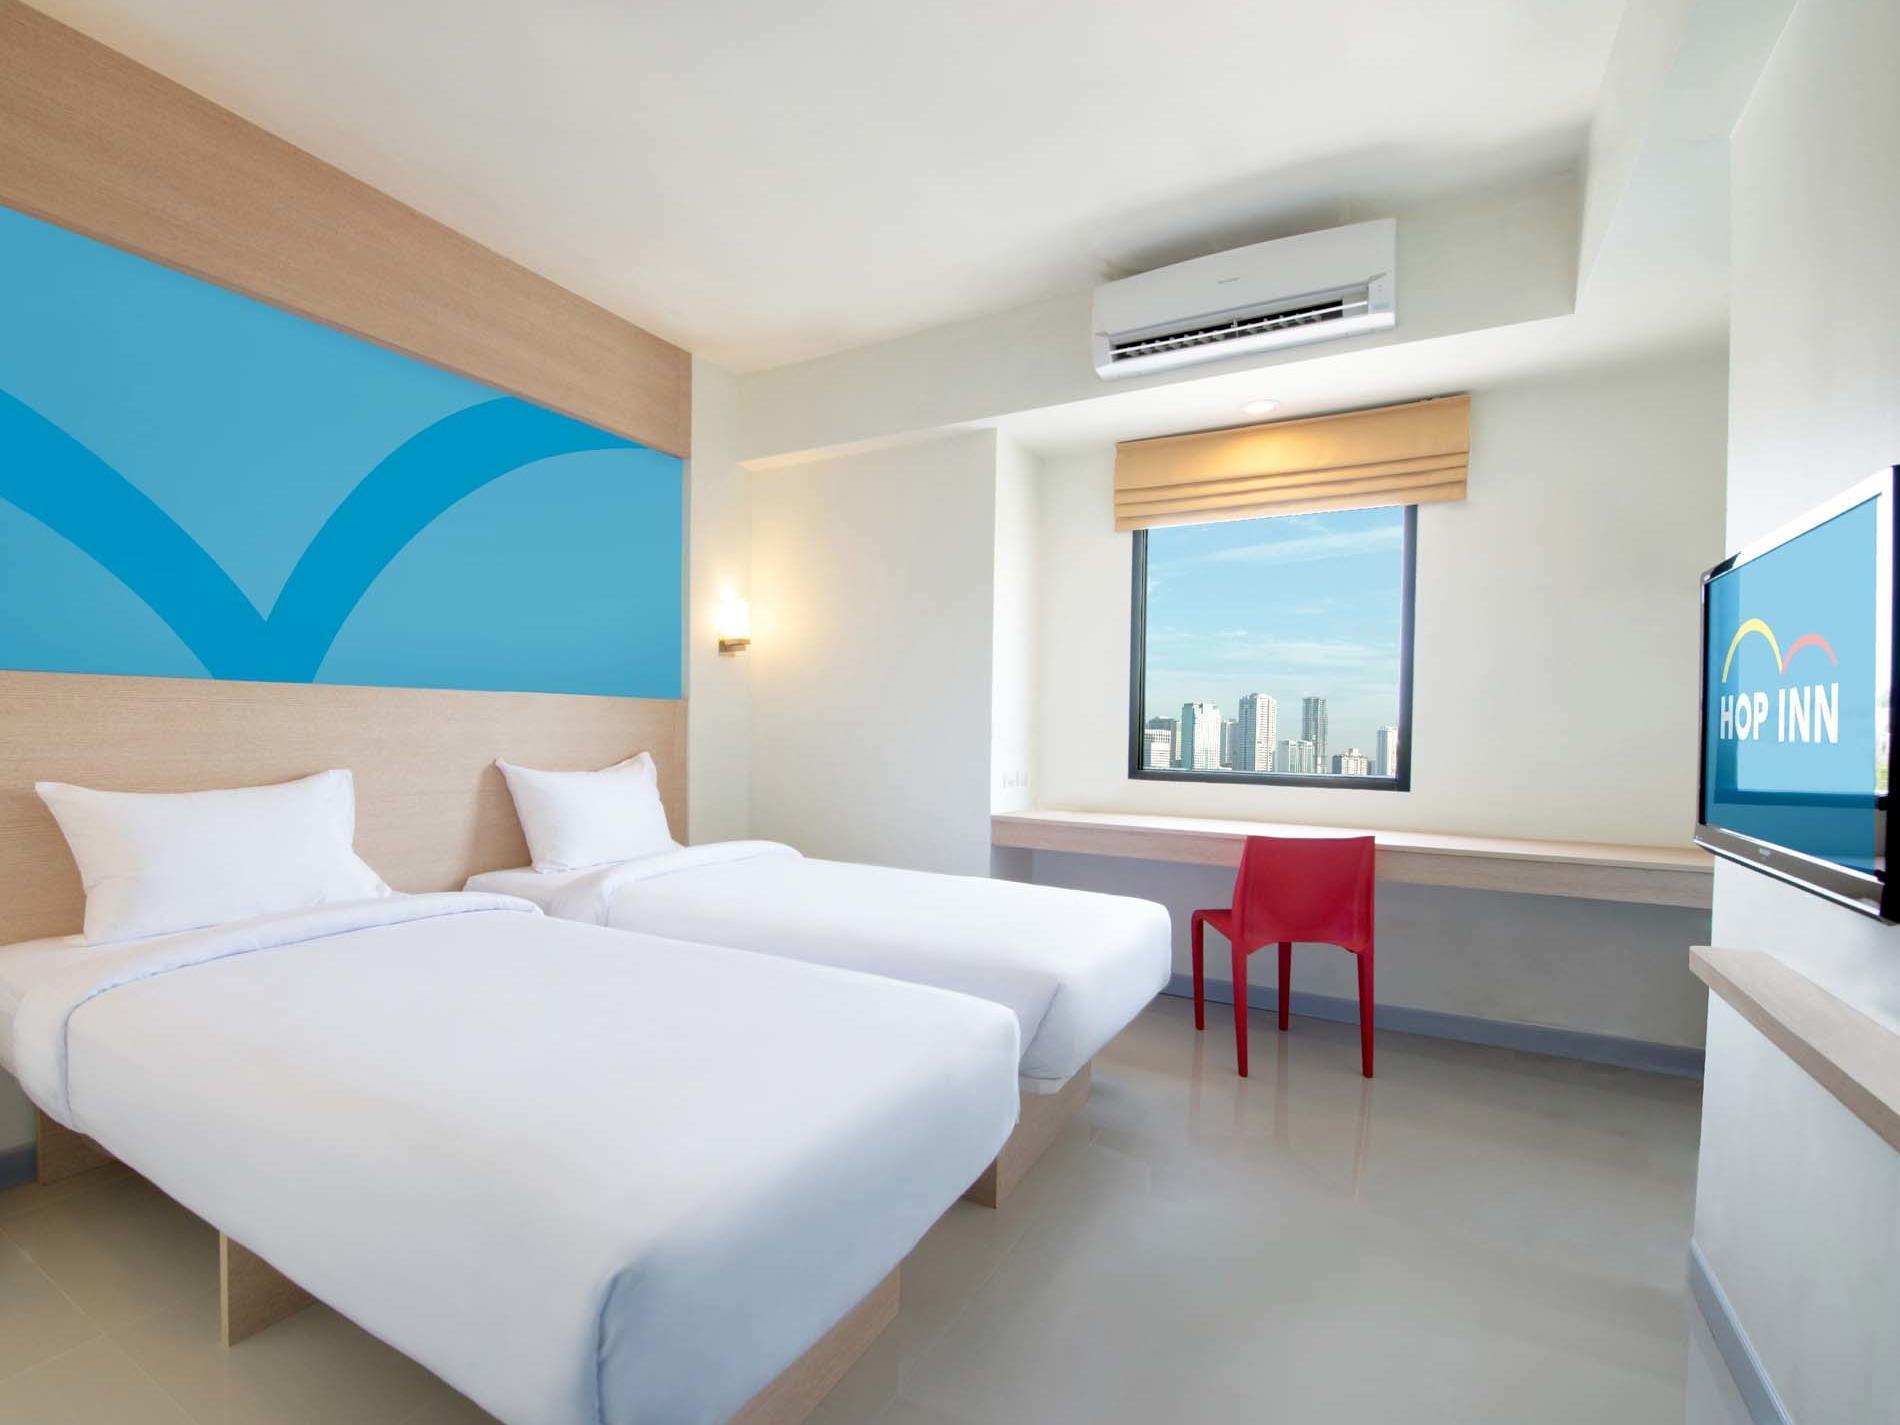 Hop Inn Hotel Aseana City Manila Book Our Budget Hotel